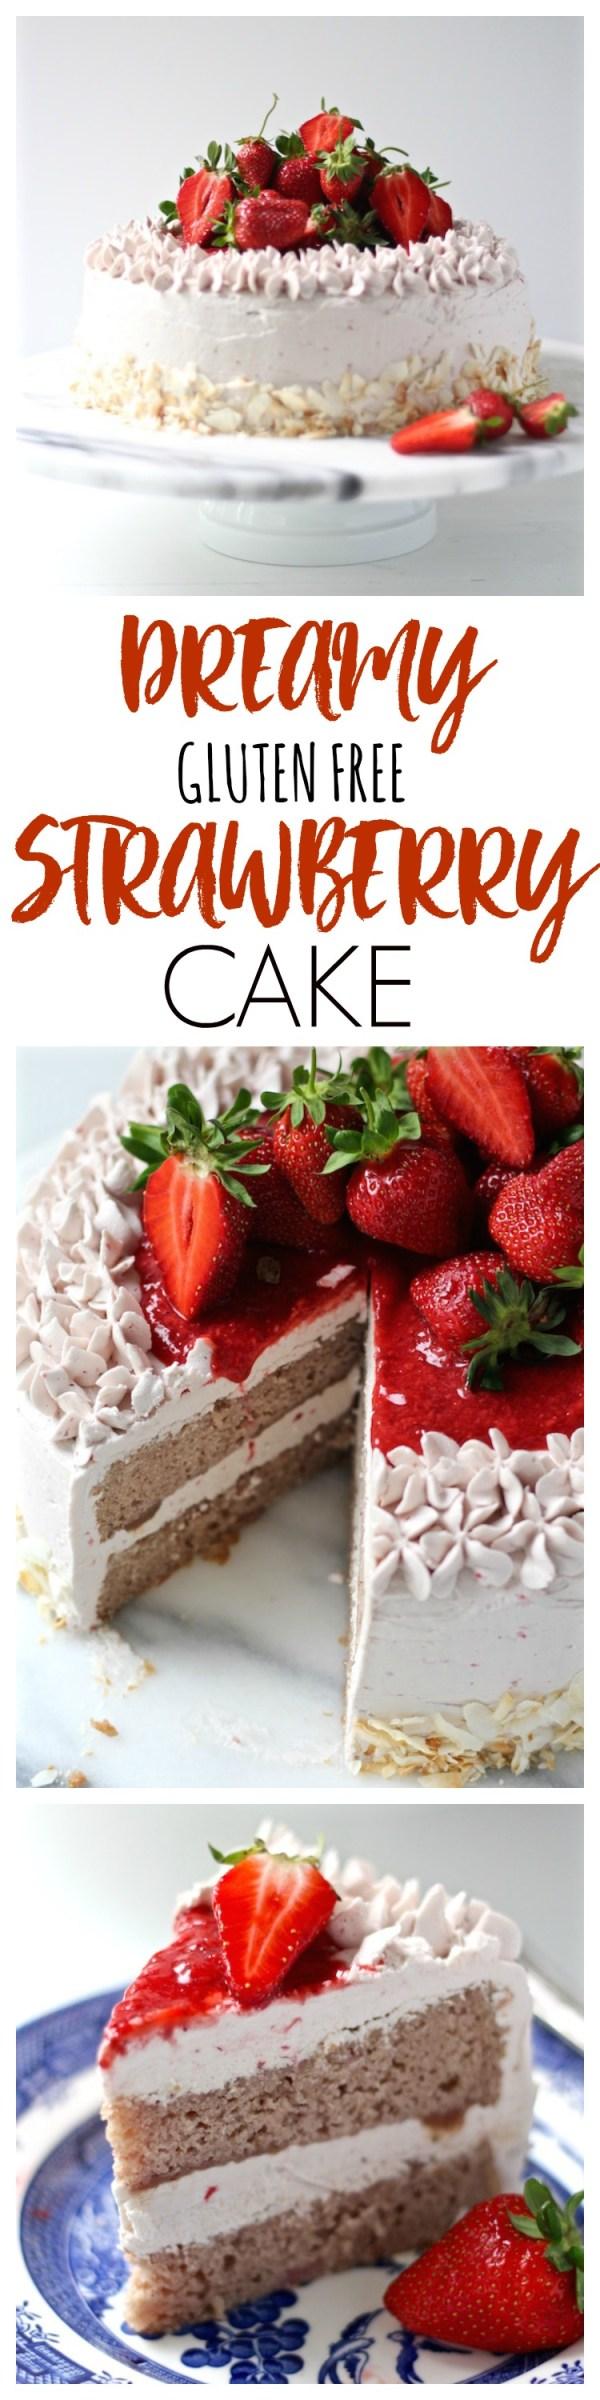 gluten free strawberry cake pinterest